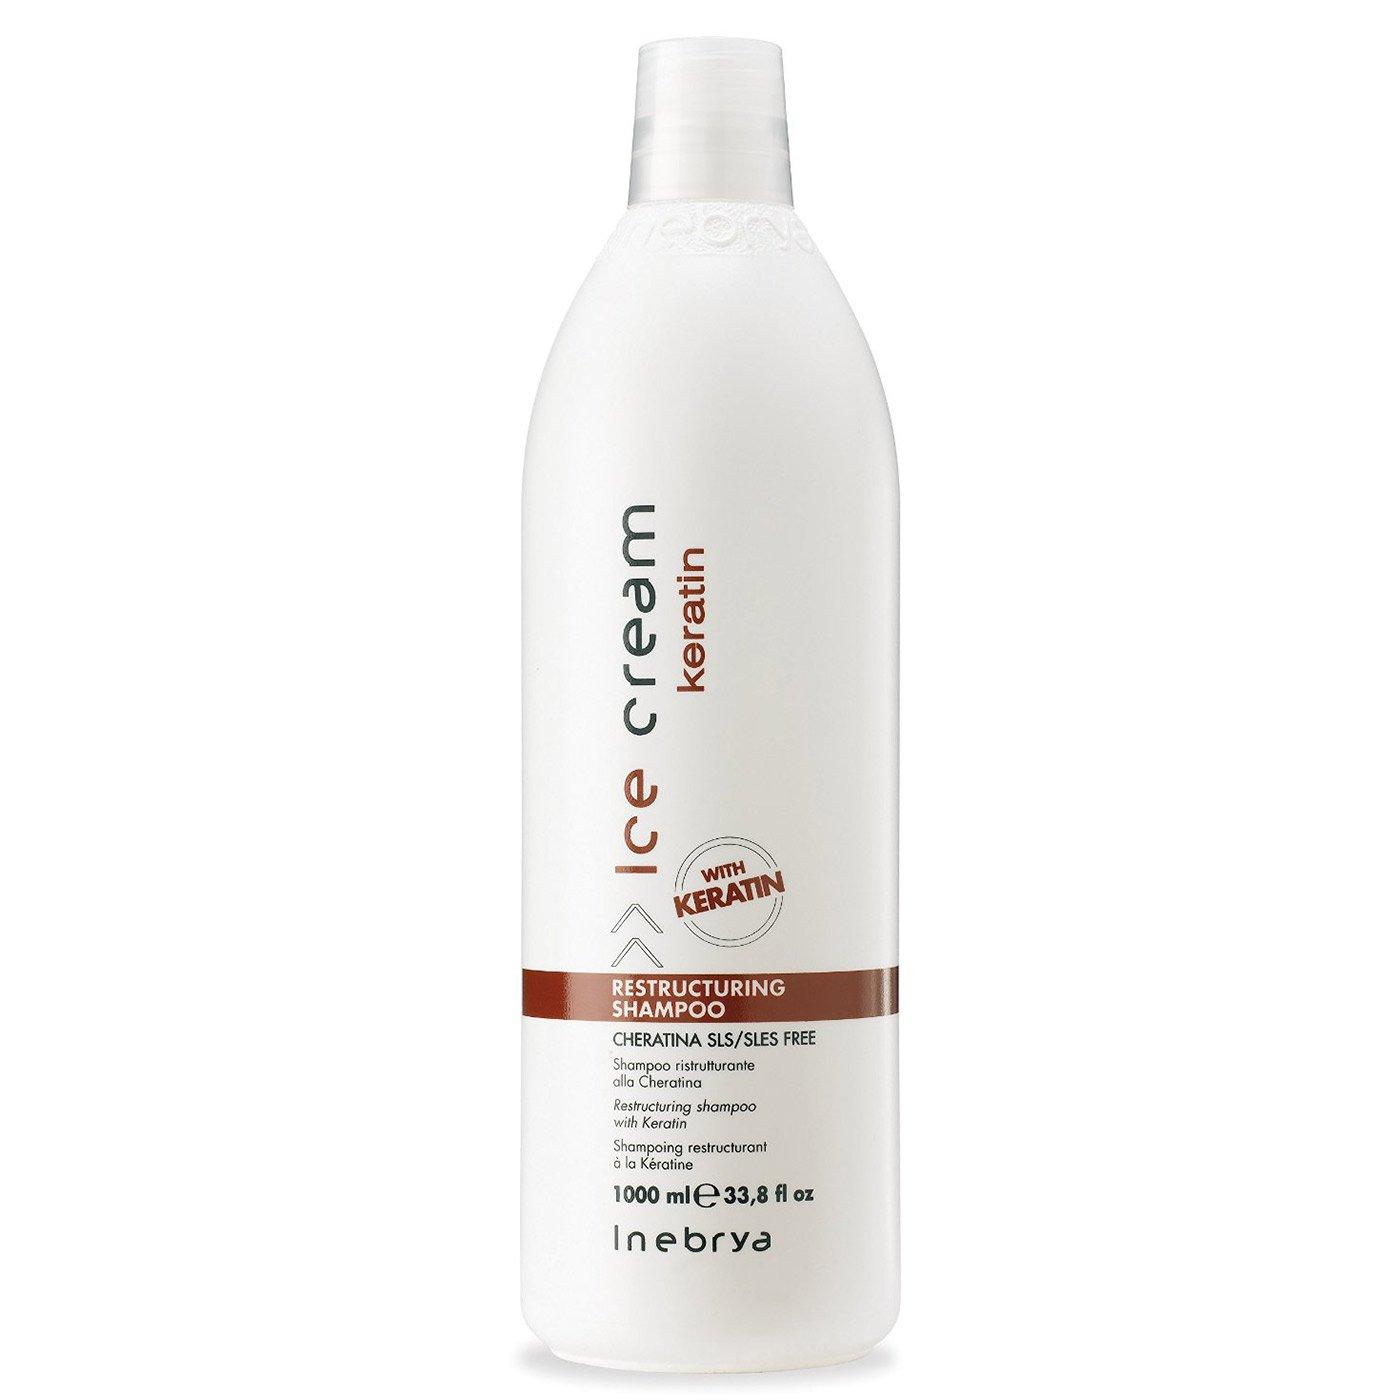 Amazon Ice Cream Keratin Restructuring Shampoo 33 8oz by